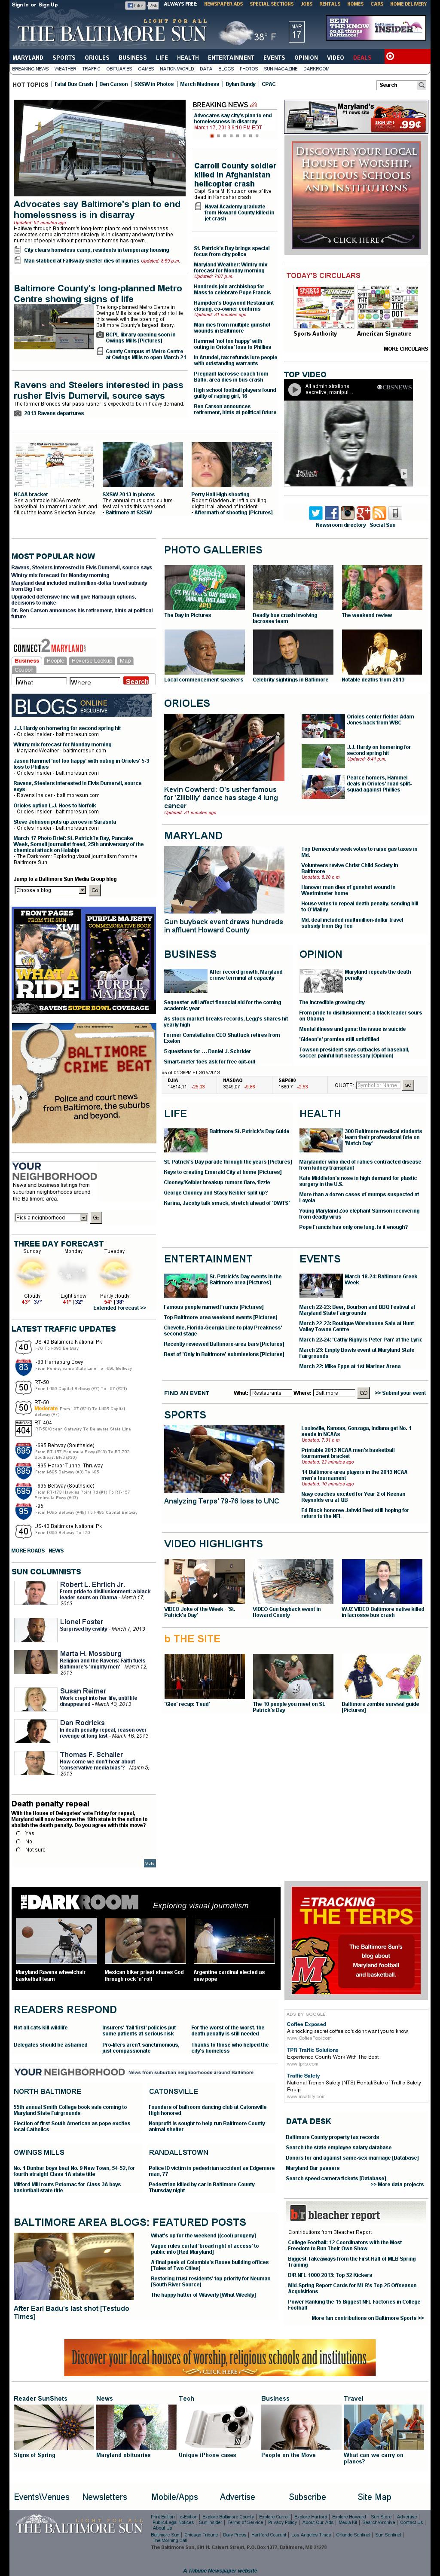 The Baltimore Sun at Monday March 18, 2013, 2:01 a.m. UTC